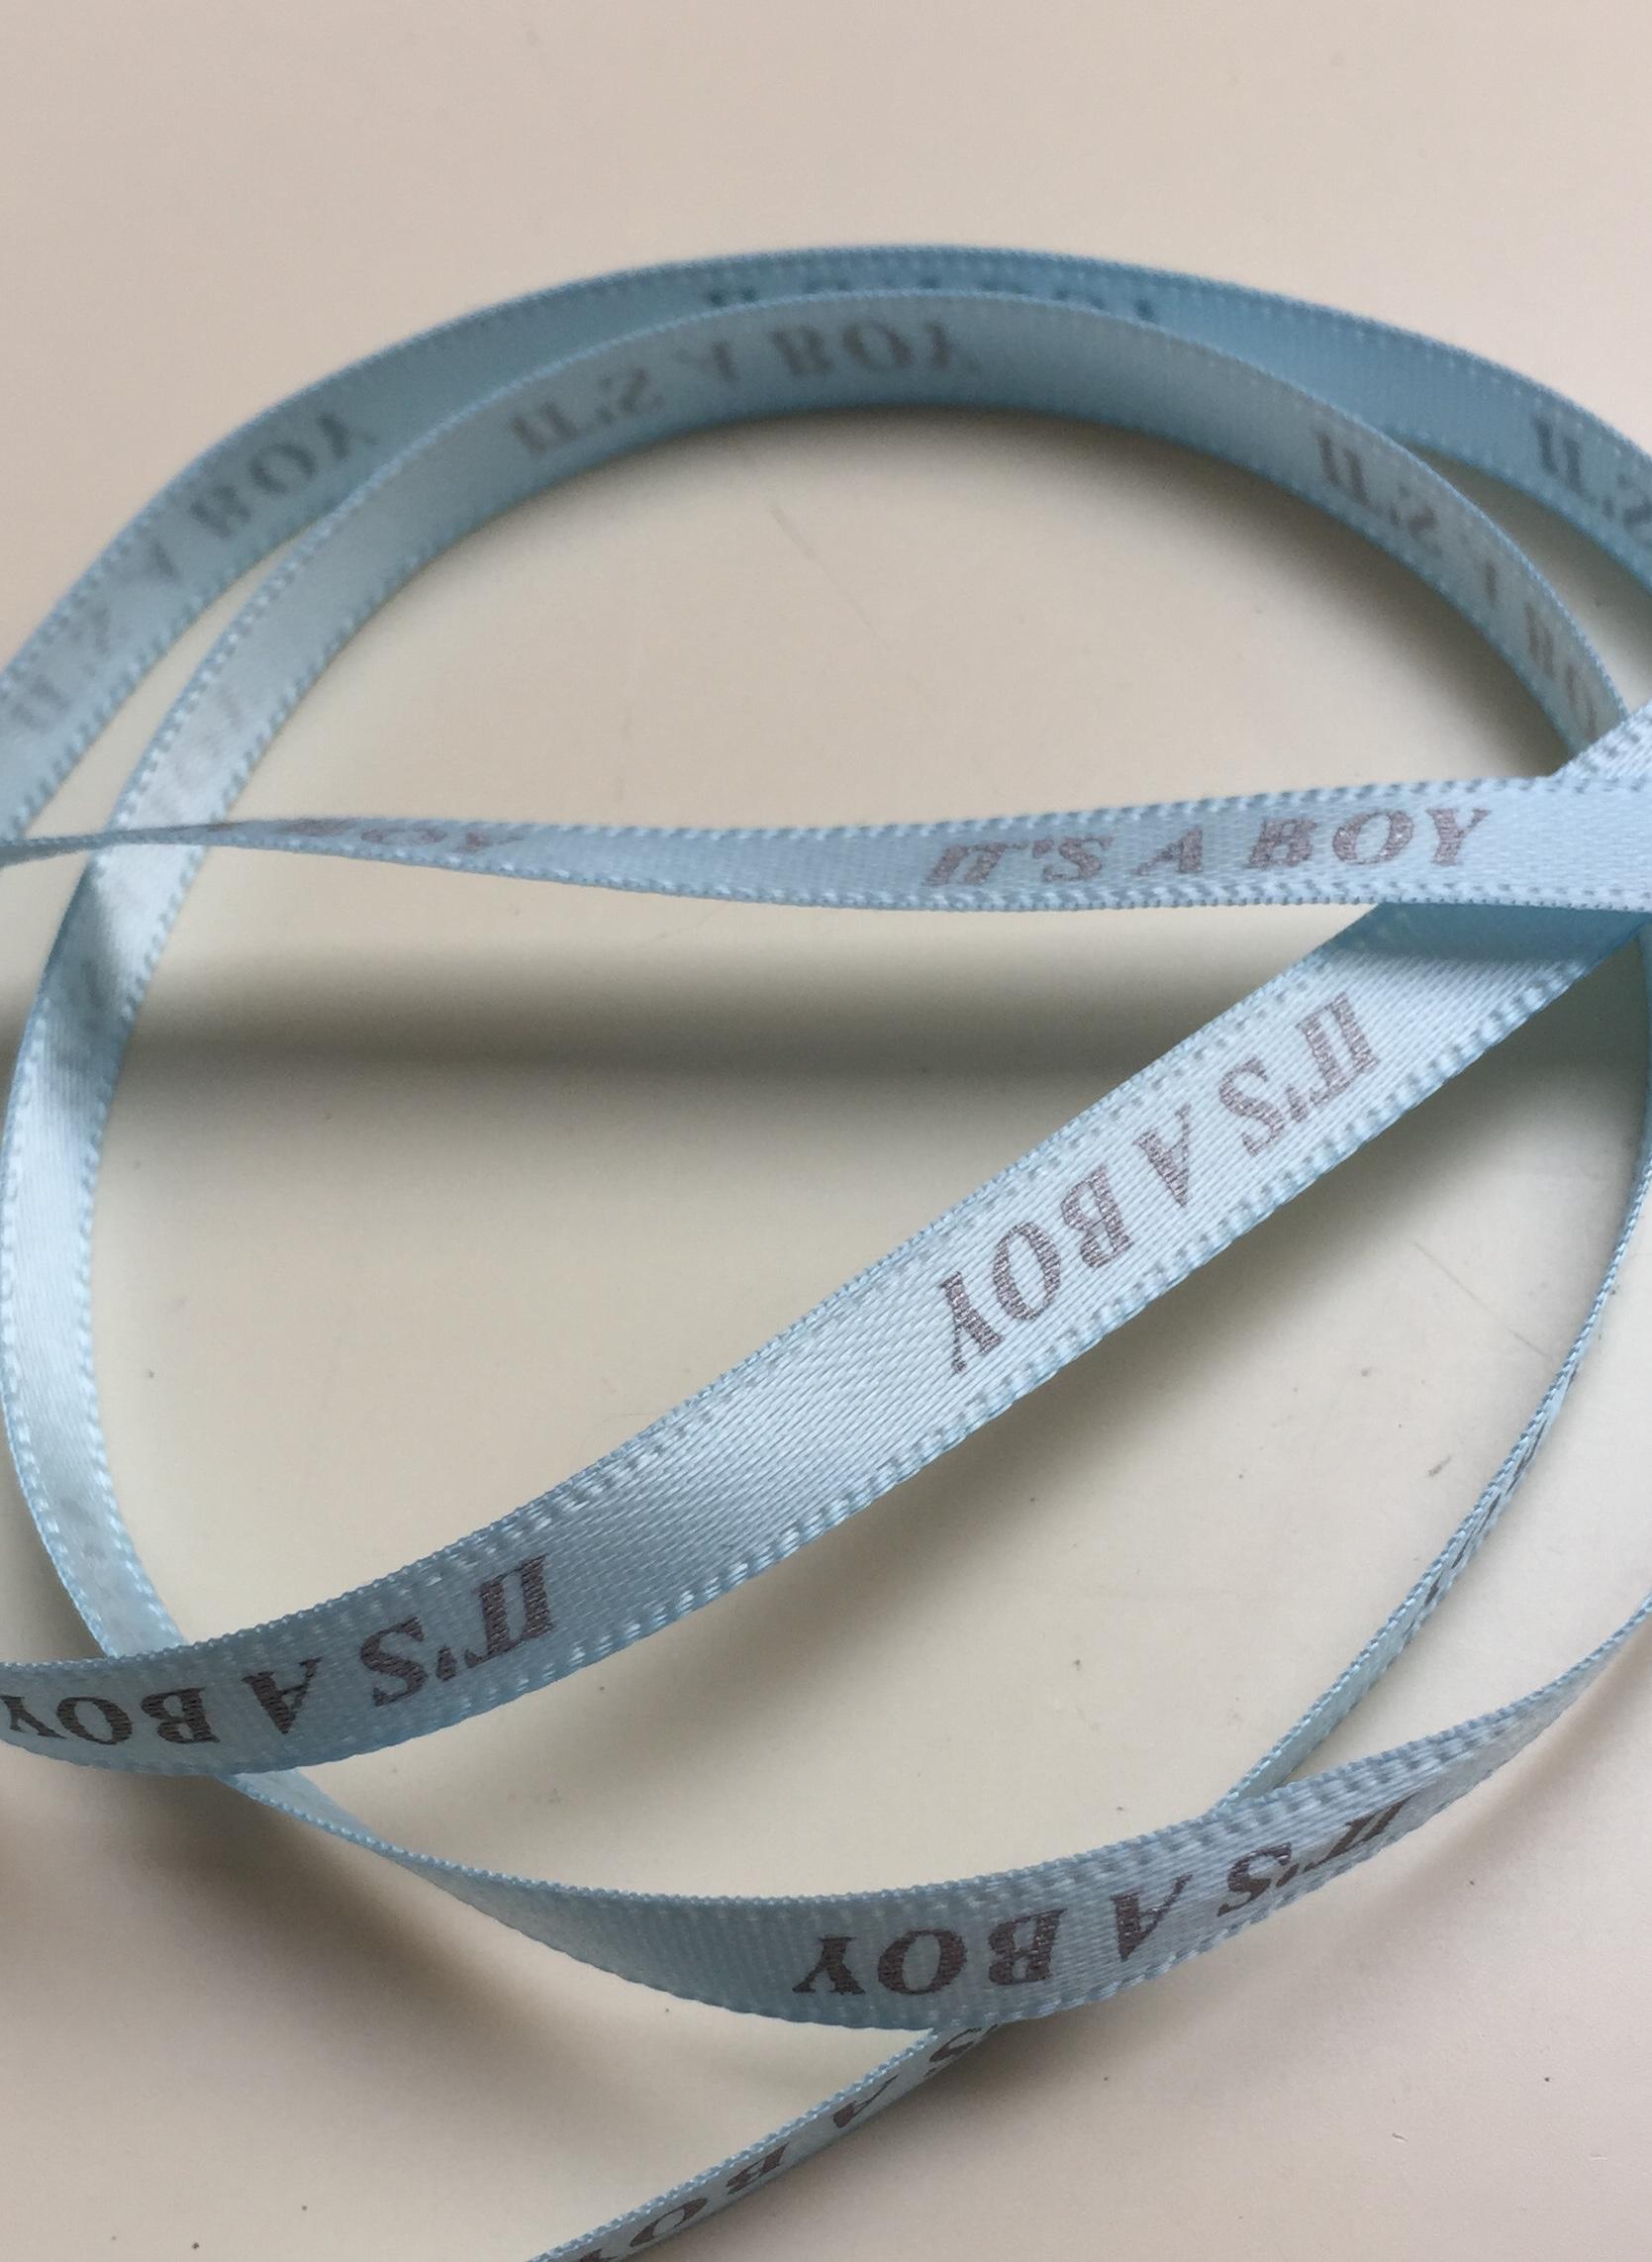 1m Its a boy satin ribbon 6mm wide